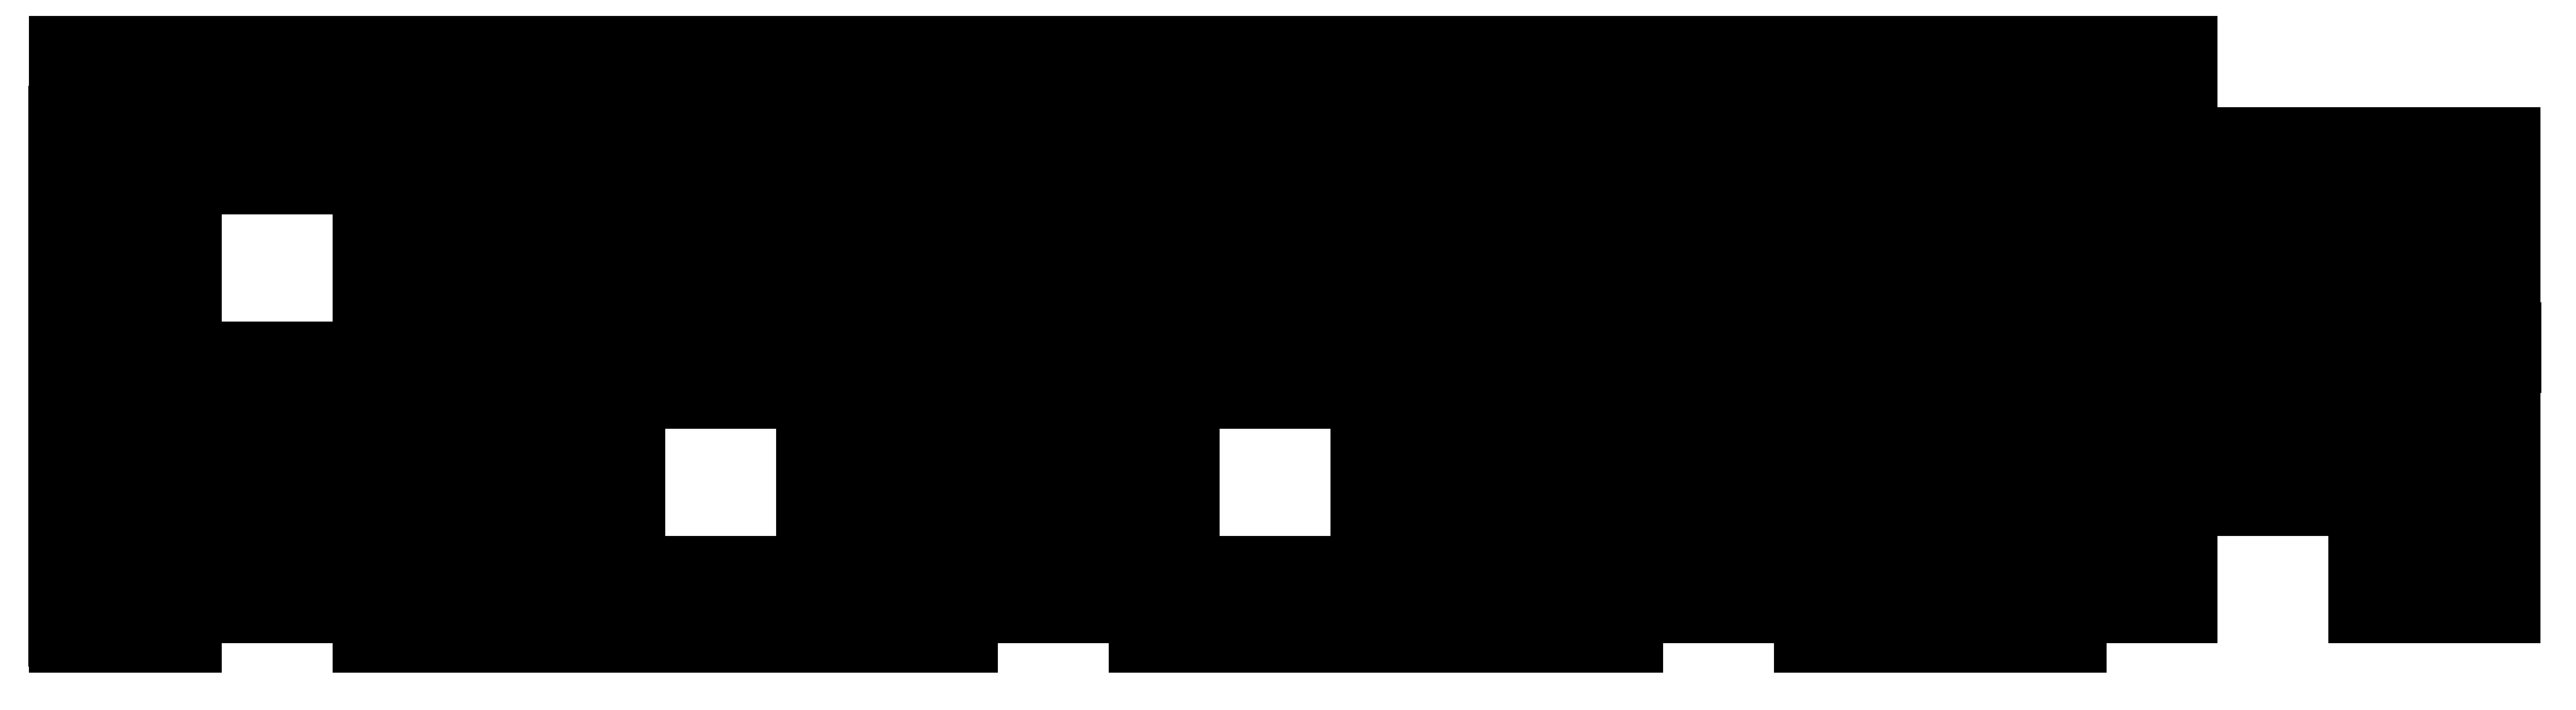 Colossium Radio_Logo_black_1